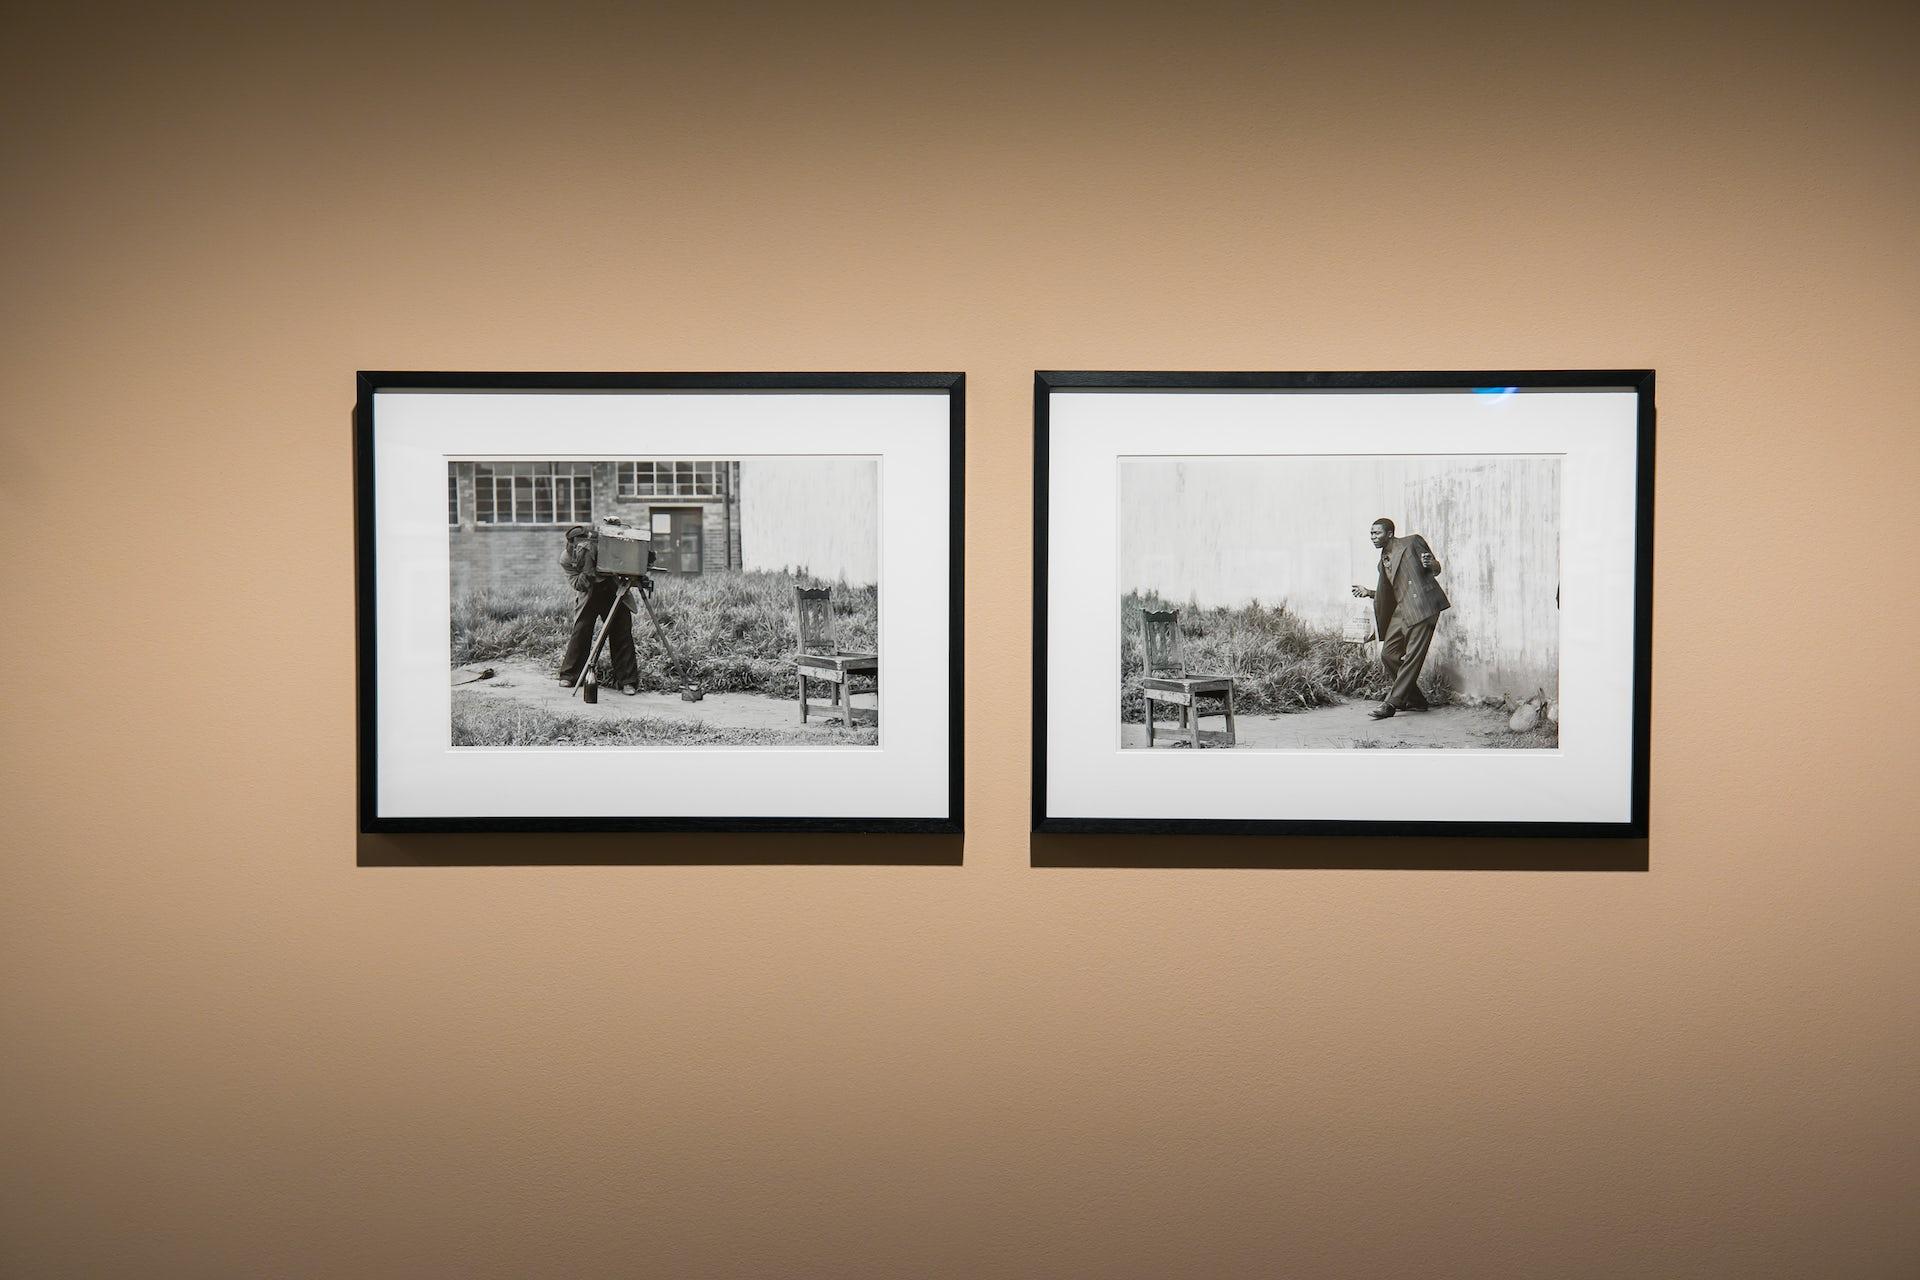 David Goldblatt's kind, calm photographs of South Africa exist in a morality minefield